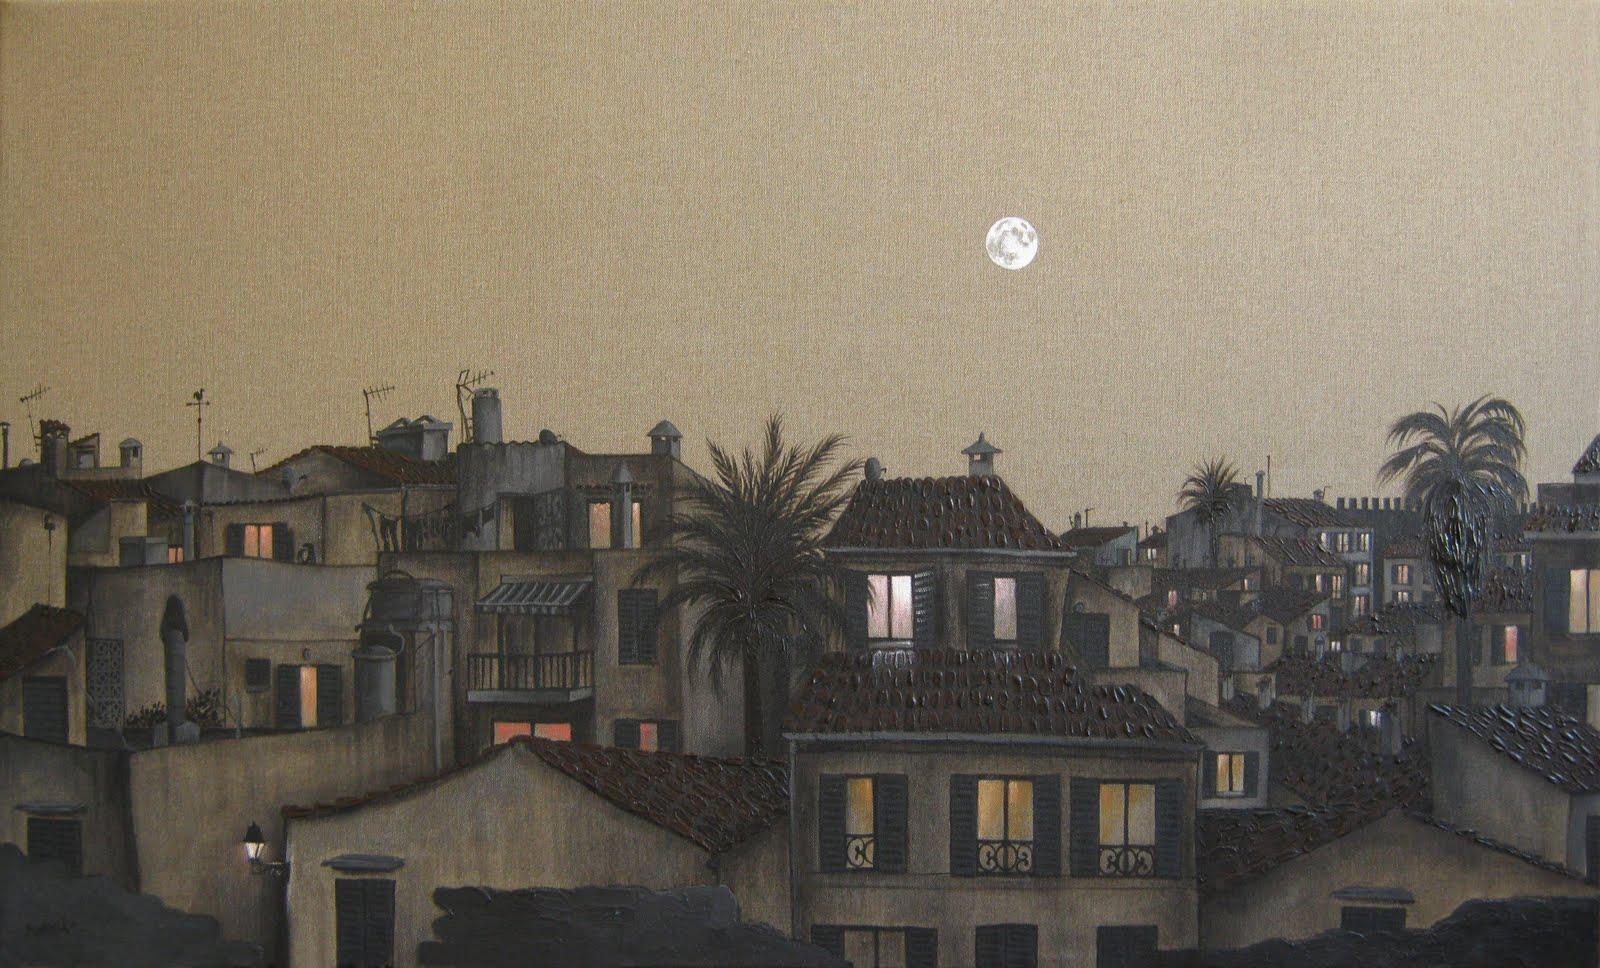 Full moon over Alcudia